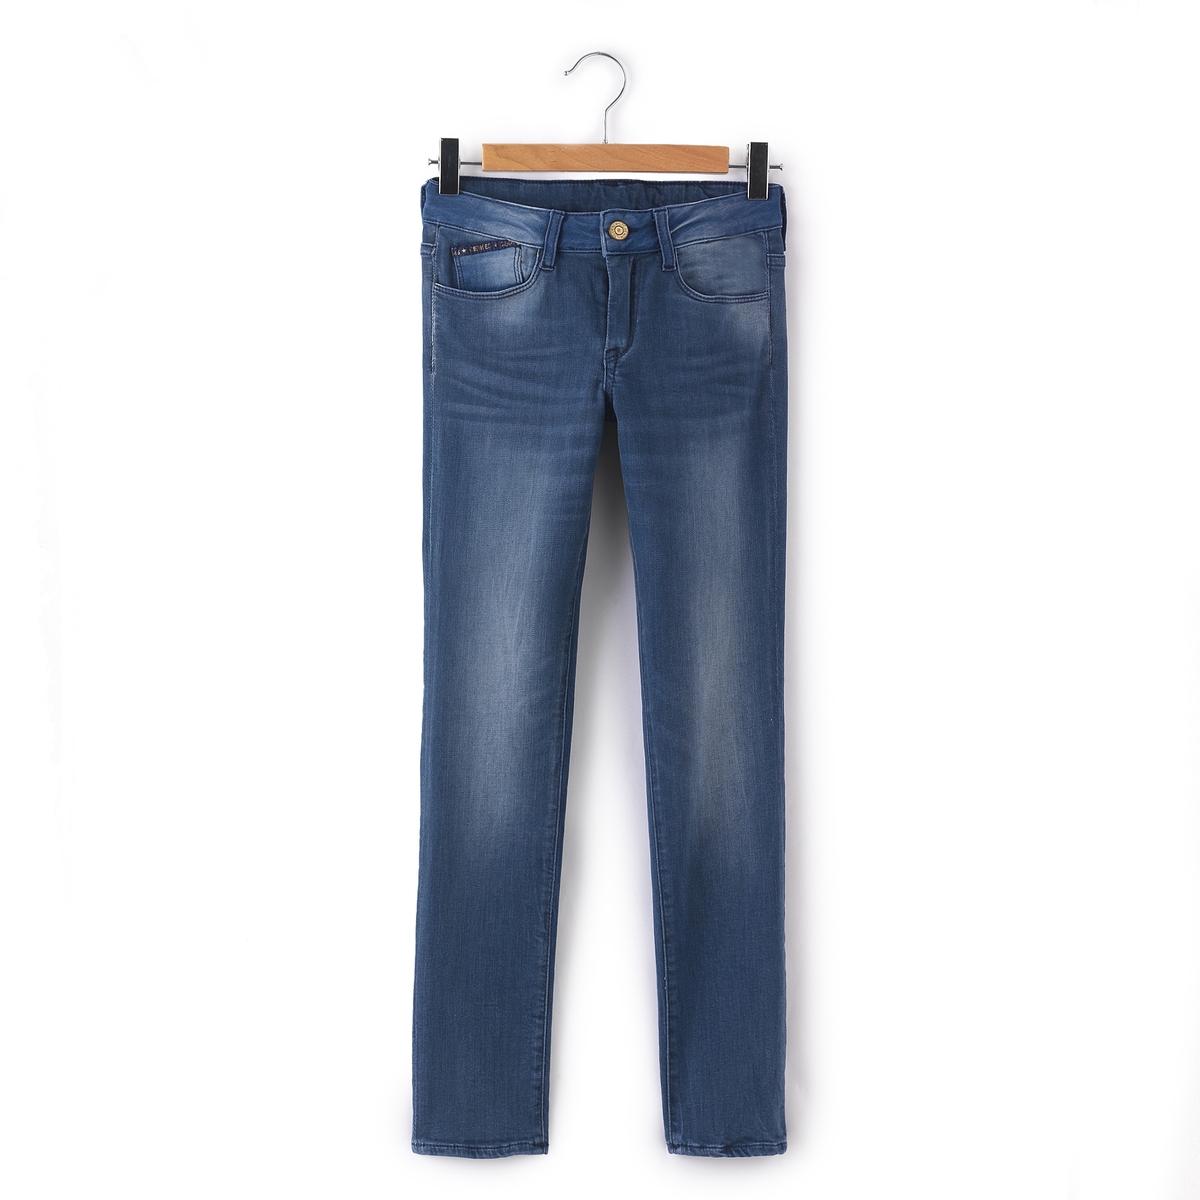 Jeans de ganga